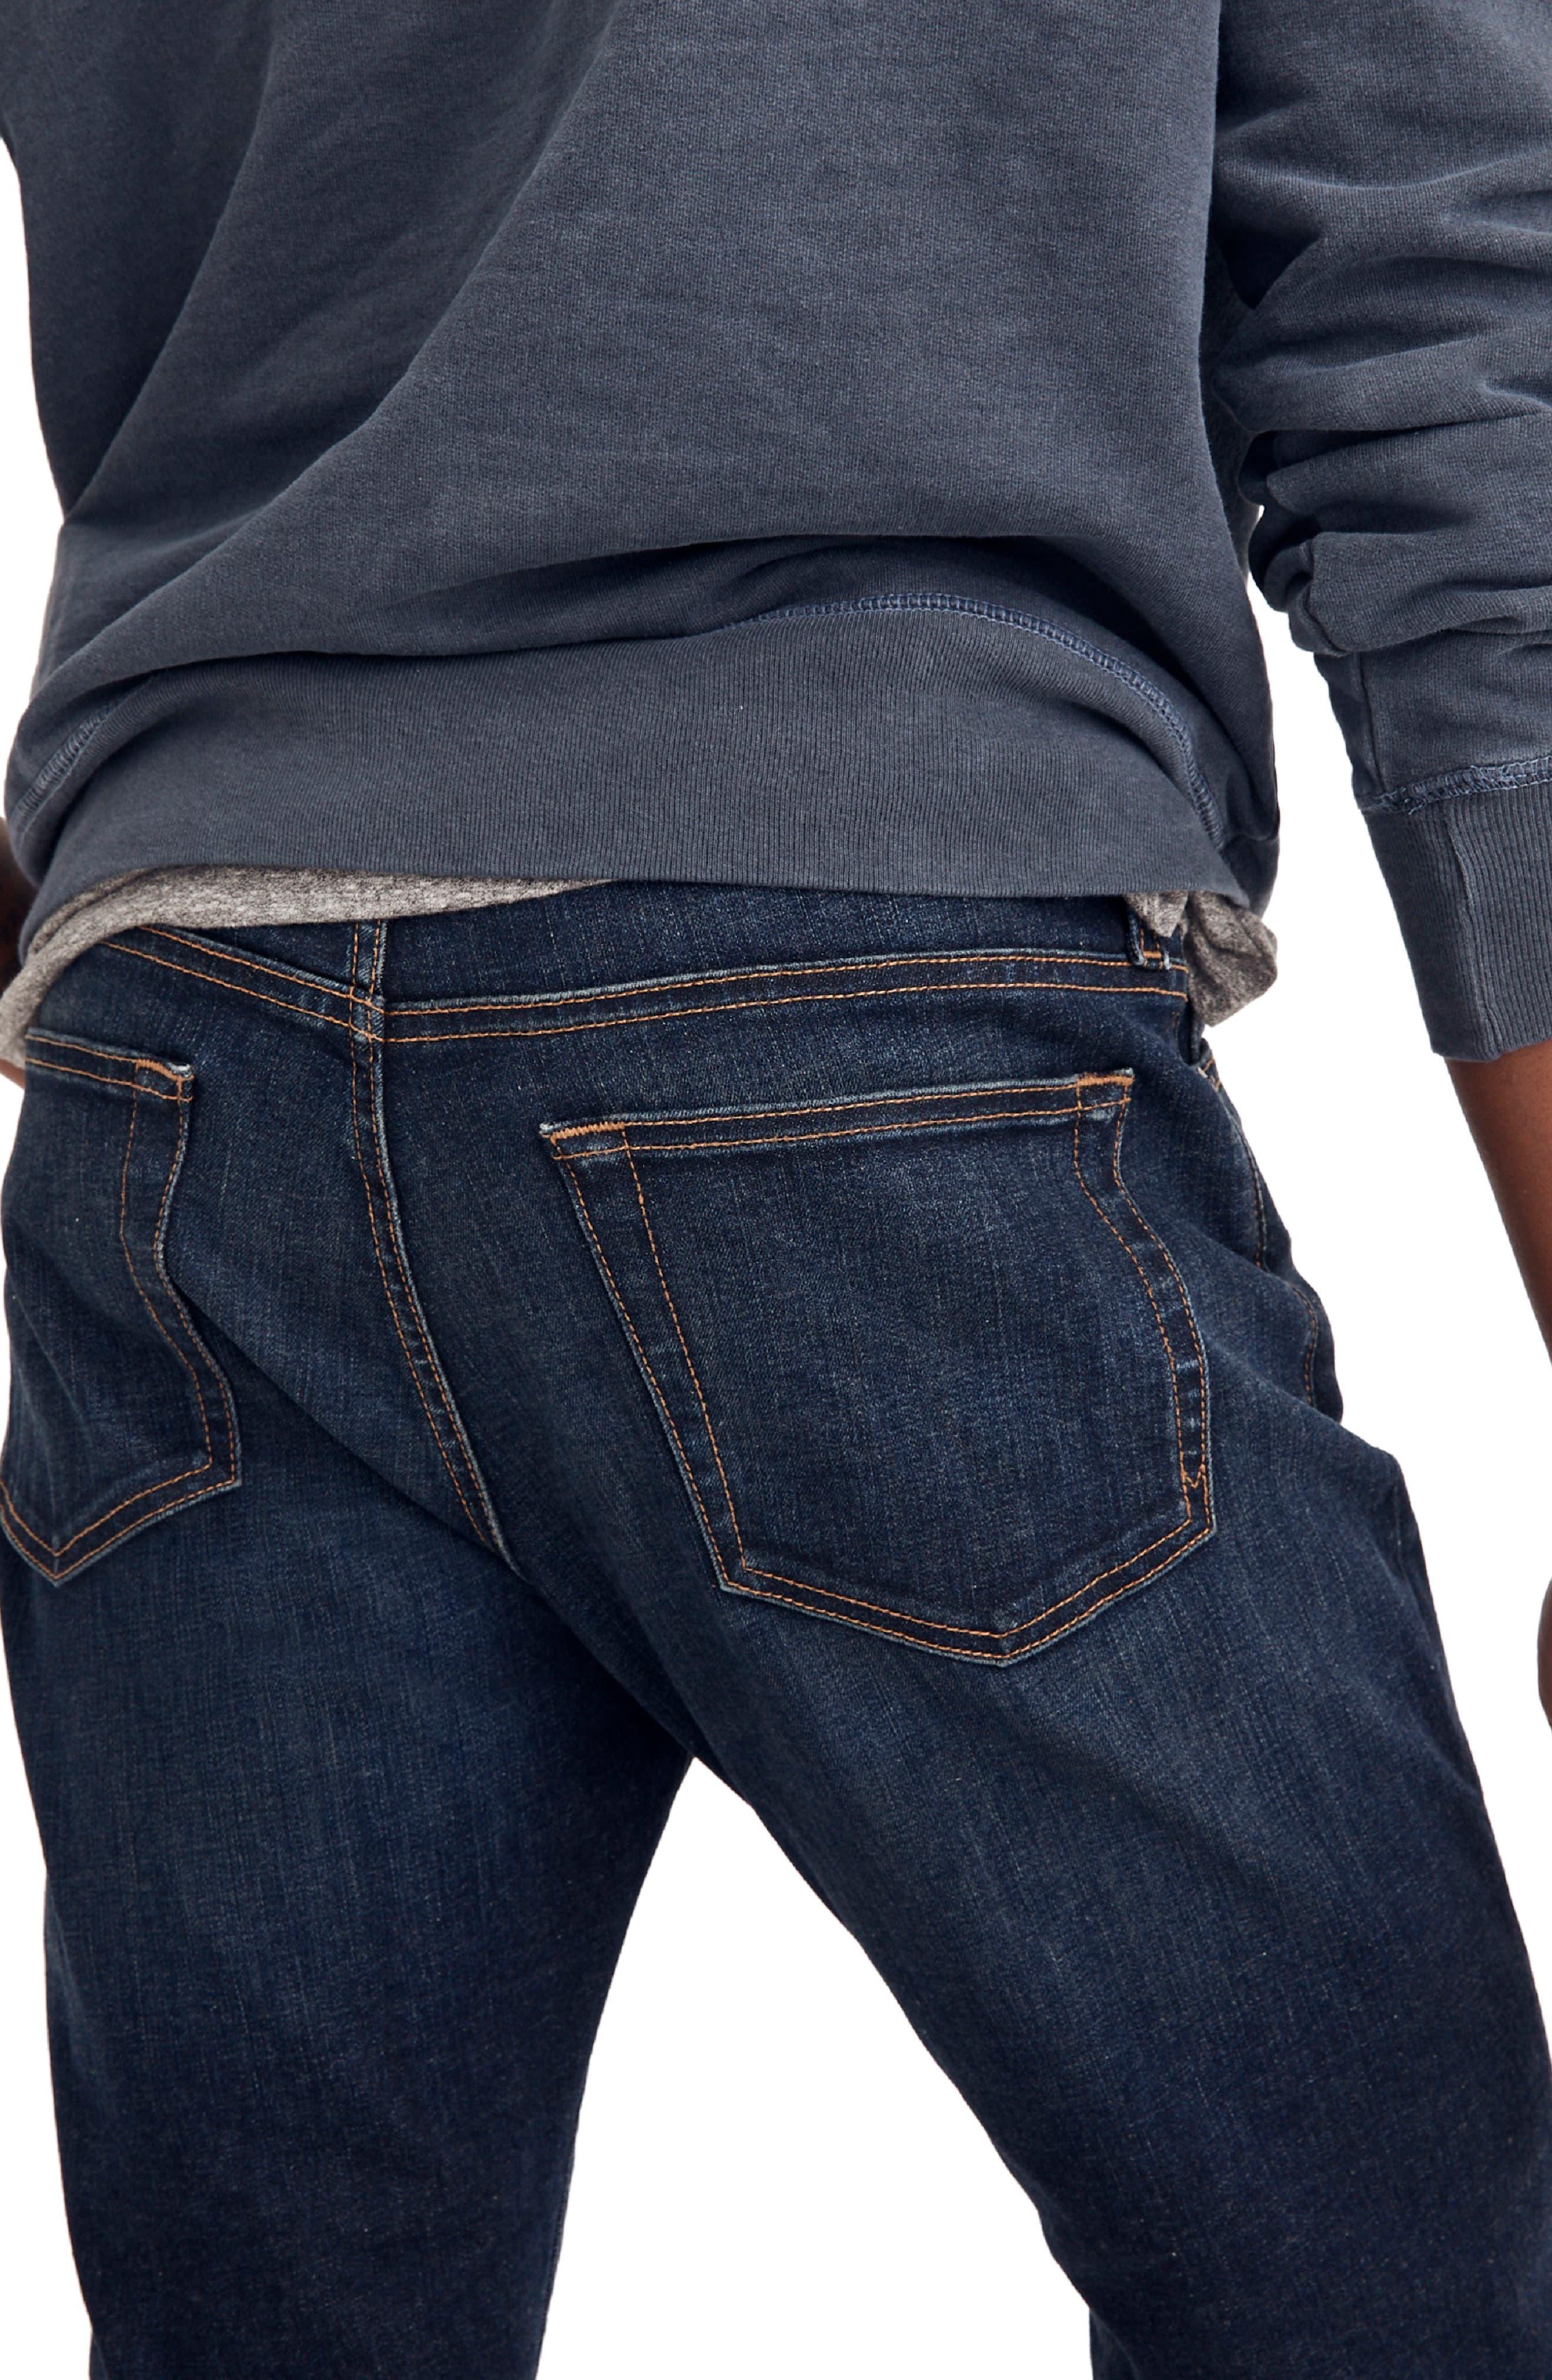 Slim Straight Fit Jeans,                             Alternate thumbnail 2, color,                             BRENFORD